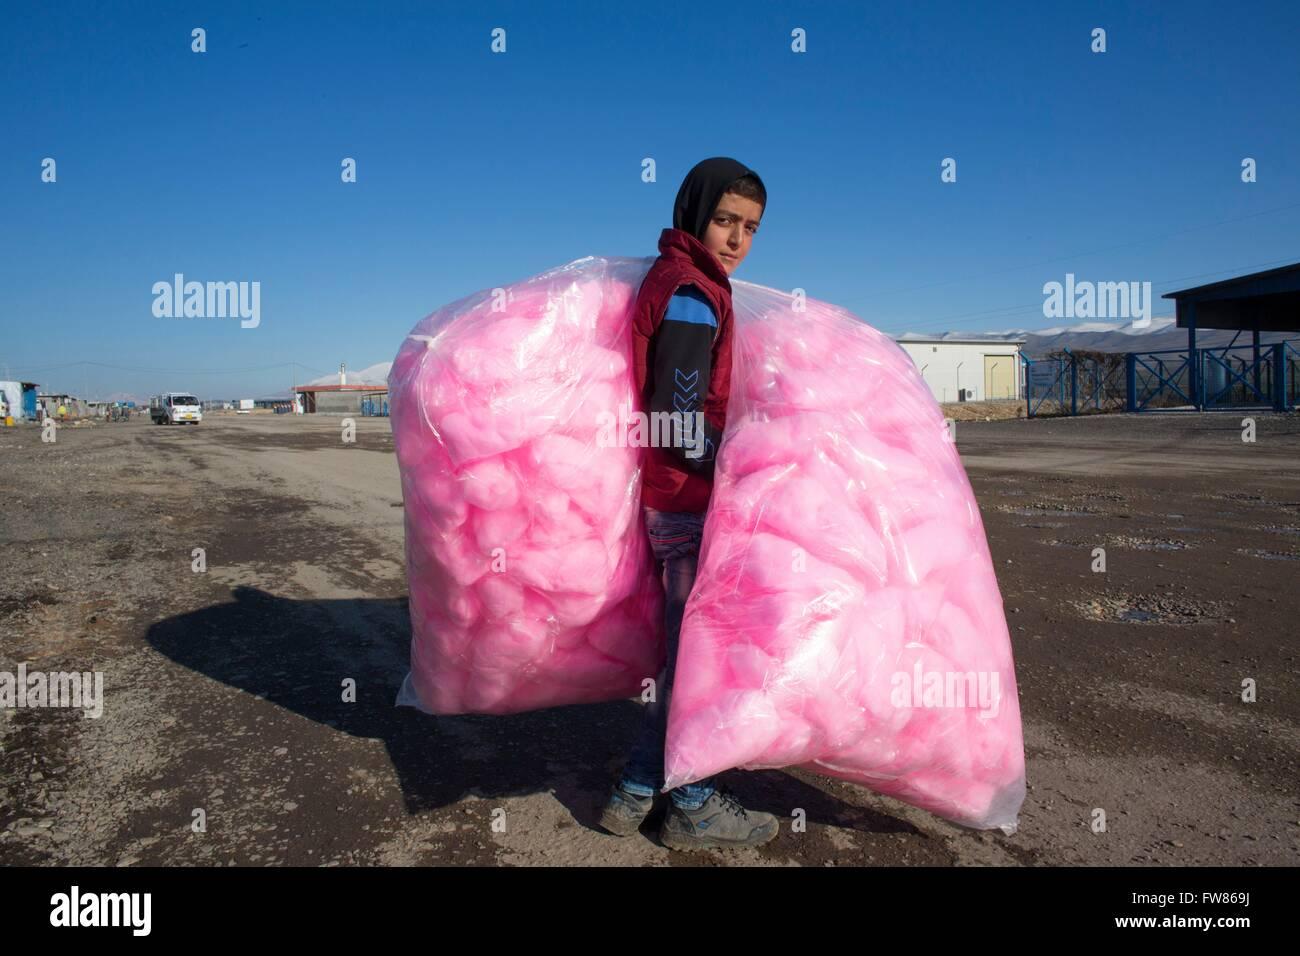 candy floss vendor in Salarara refugee camp, Iraq. - Stock Image